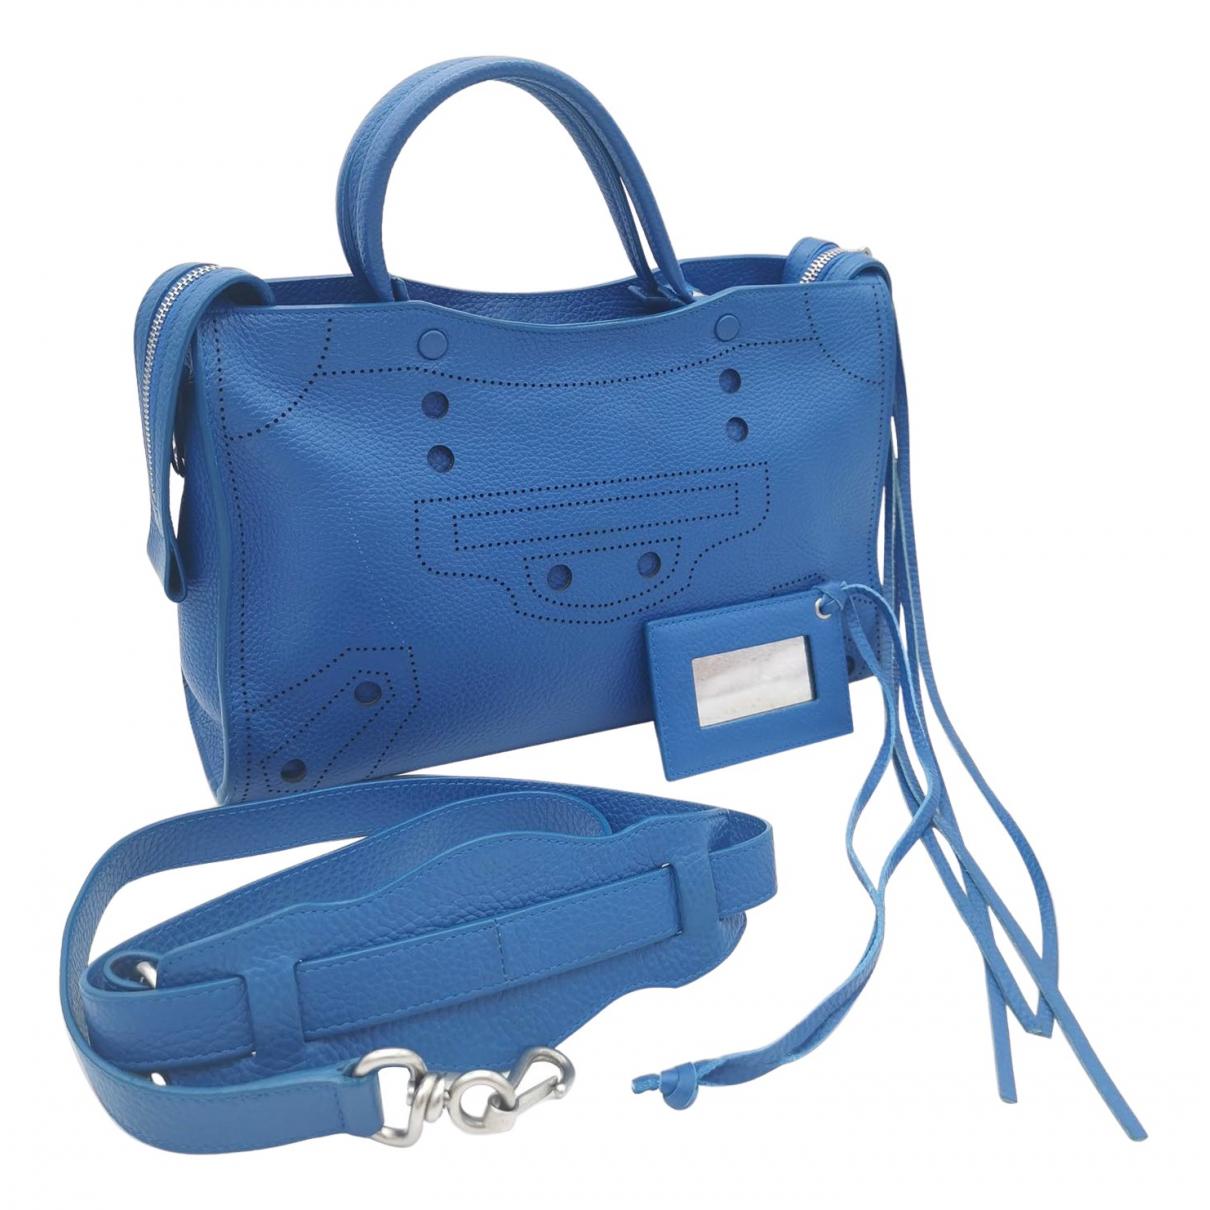 Balenciaga - Sac a main Blackout pour femme en cuir - bleu